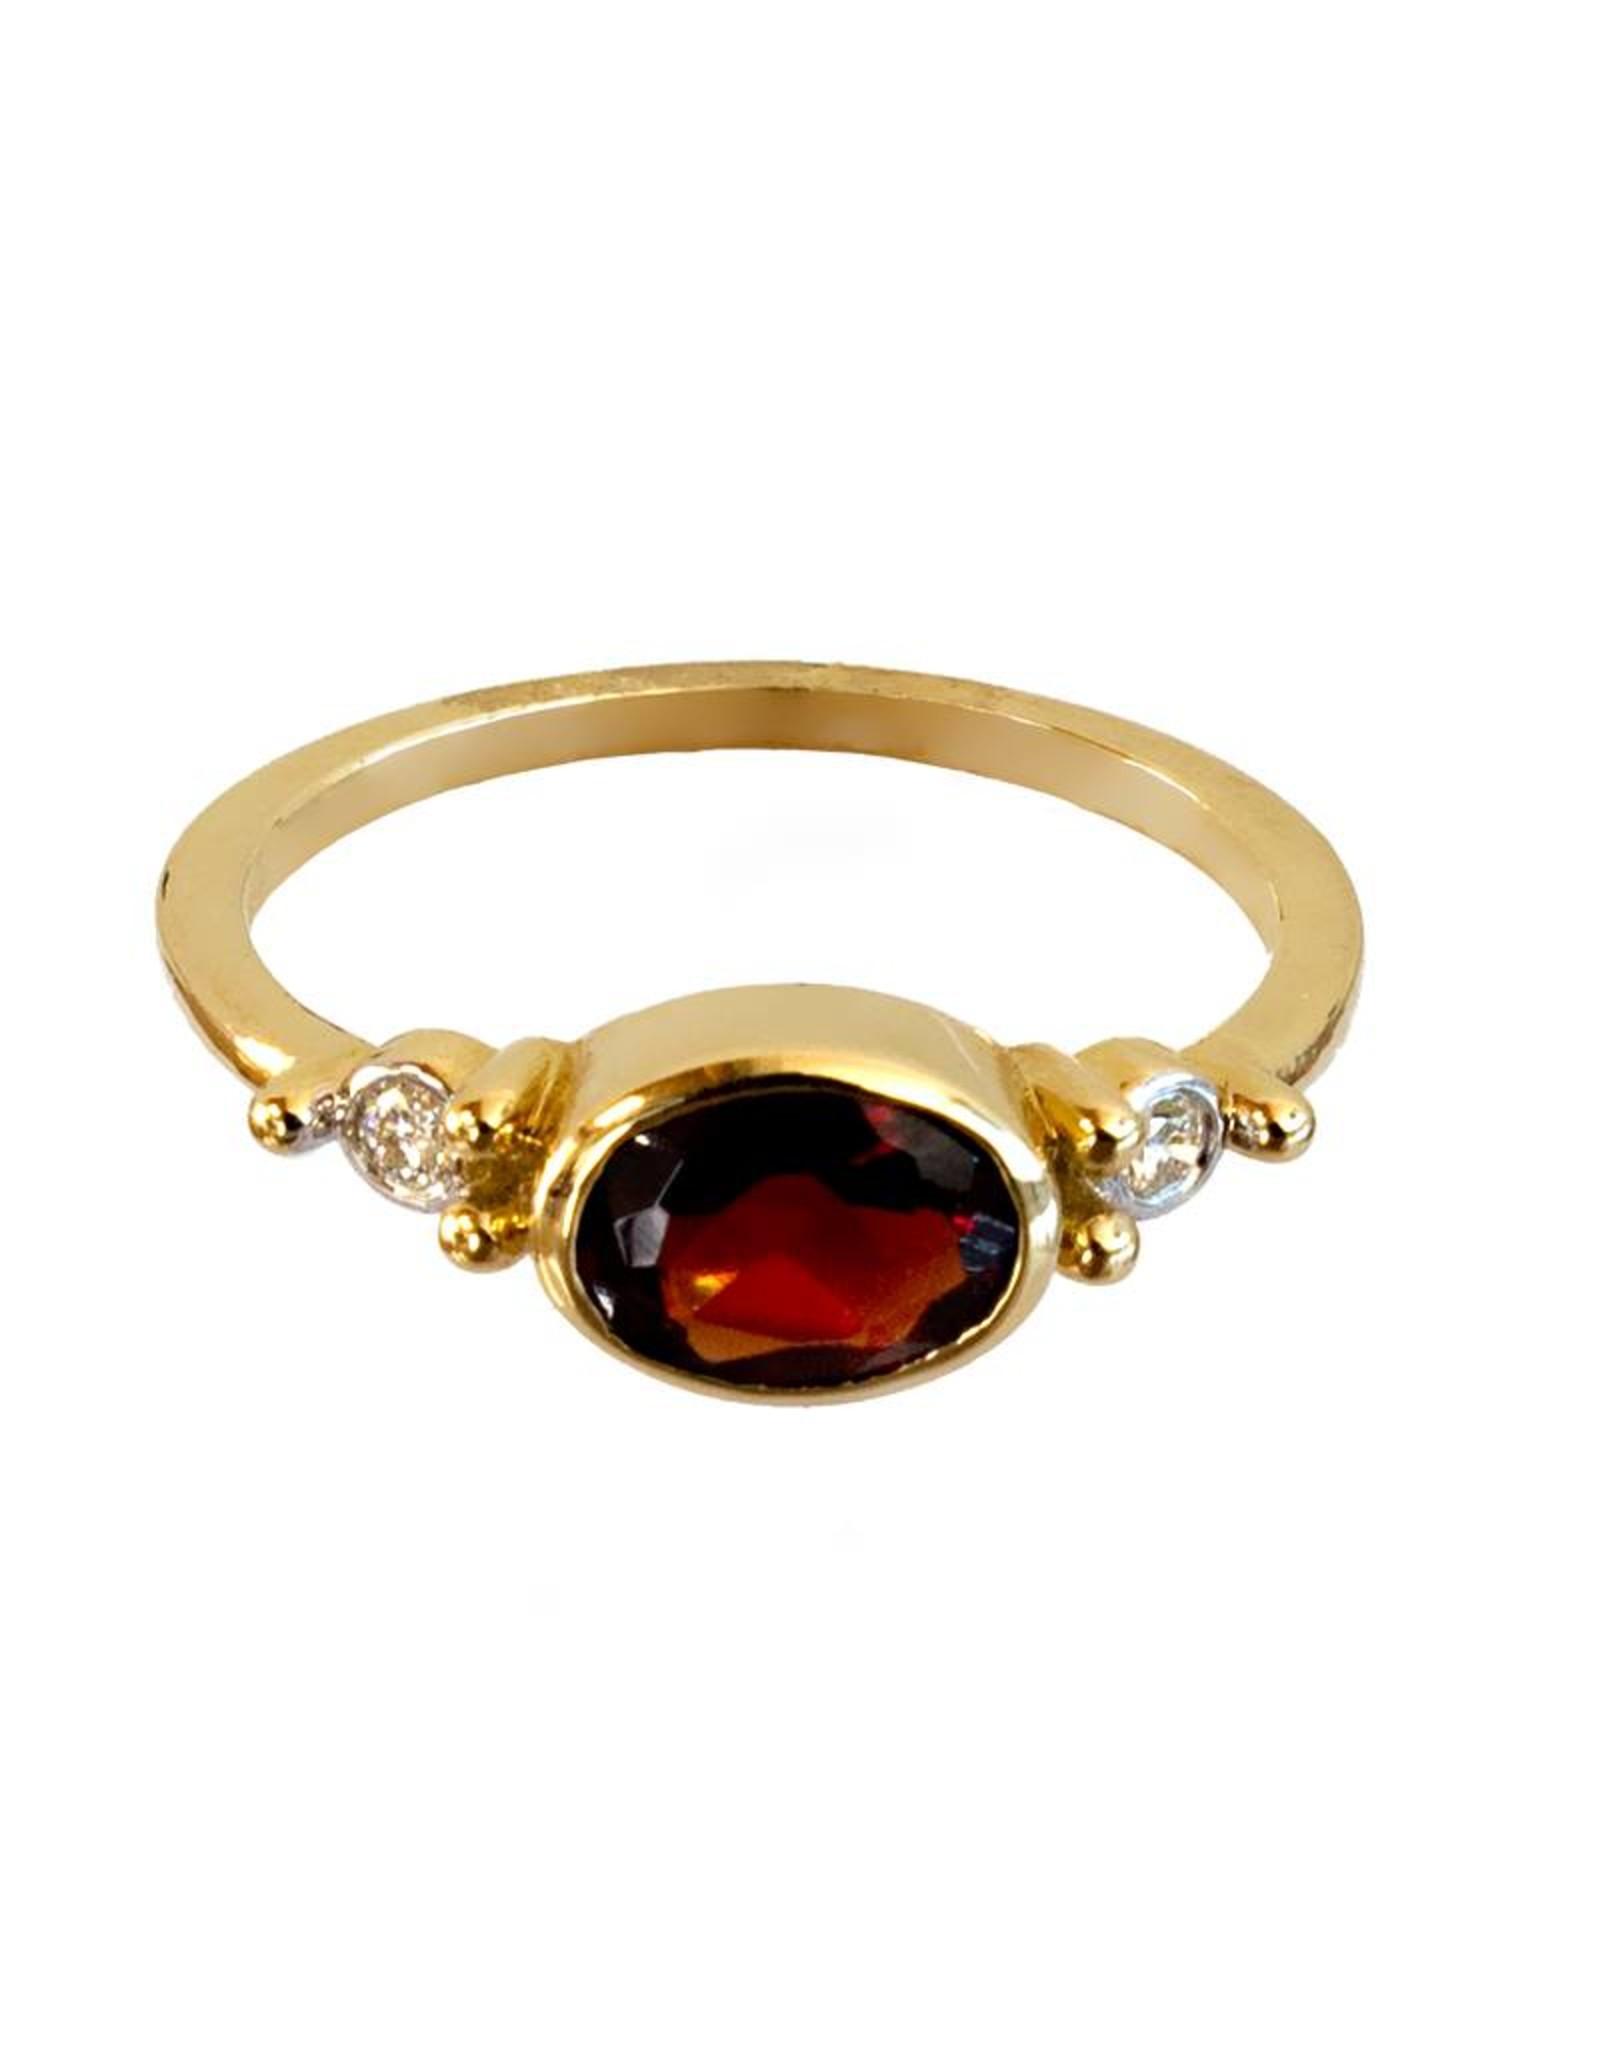 Bo Gold Ring - Goud - Hessoniet Granaat - Diamant